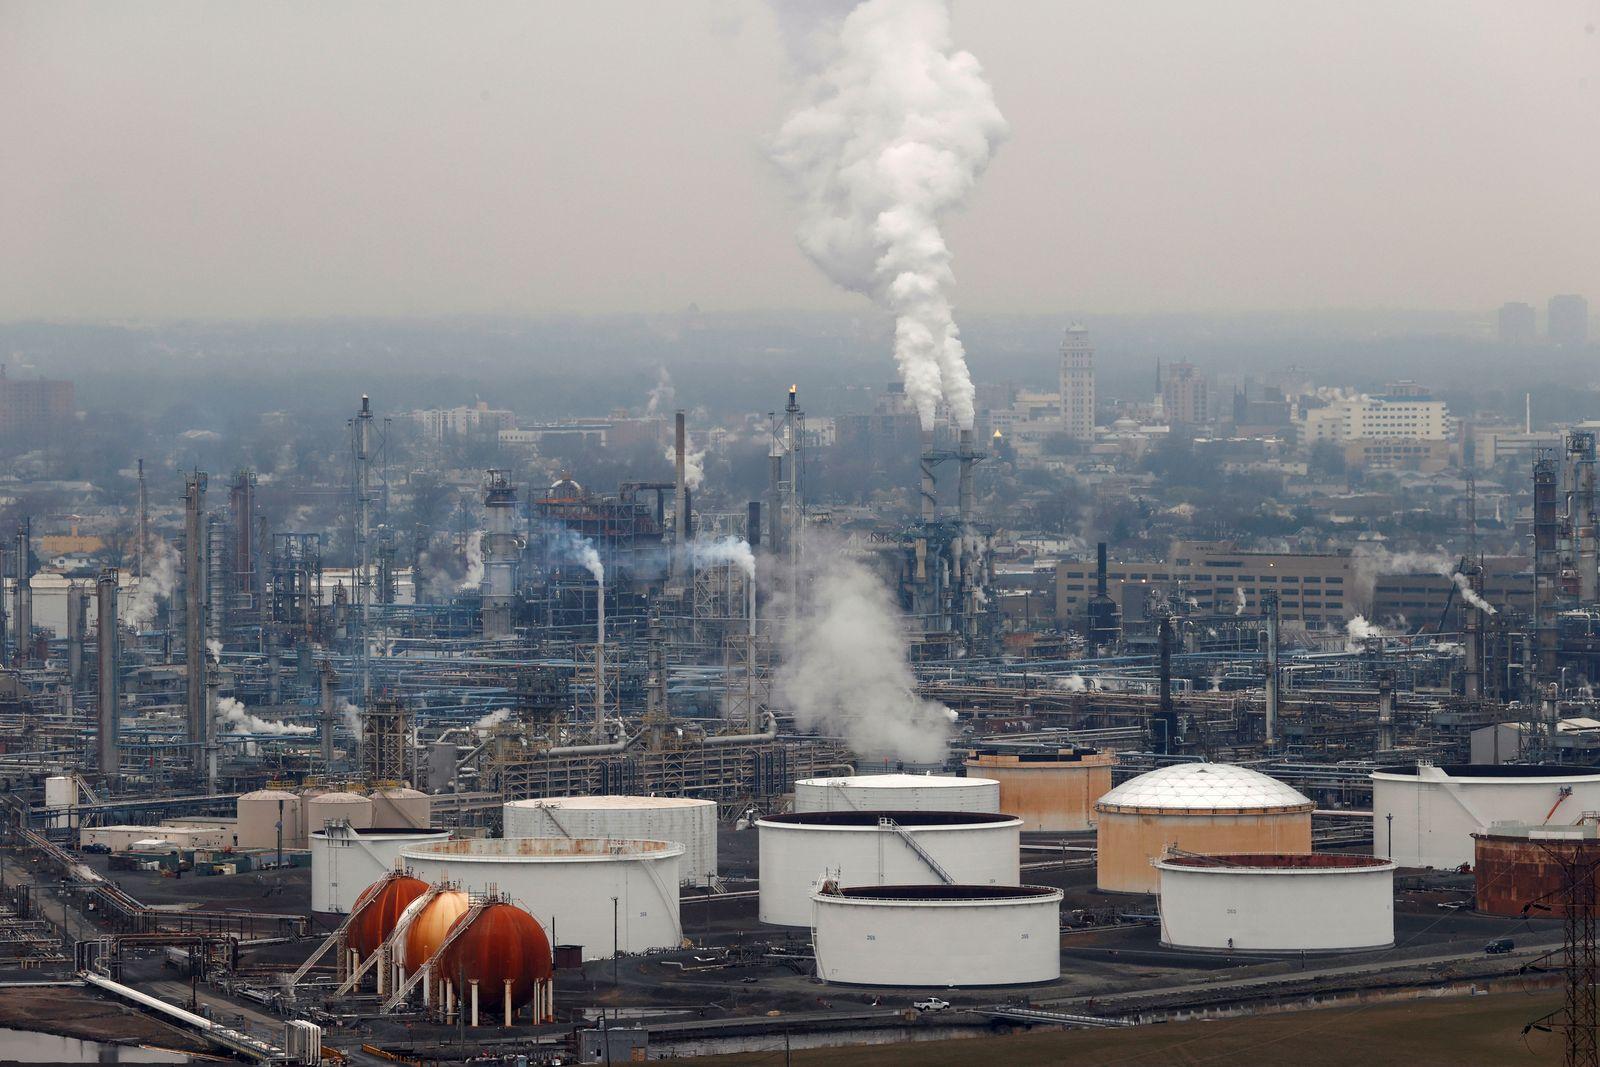 Öl / Raffinerie